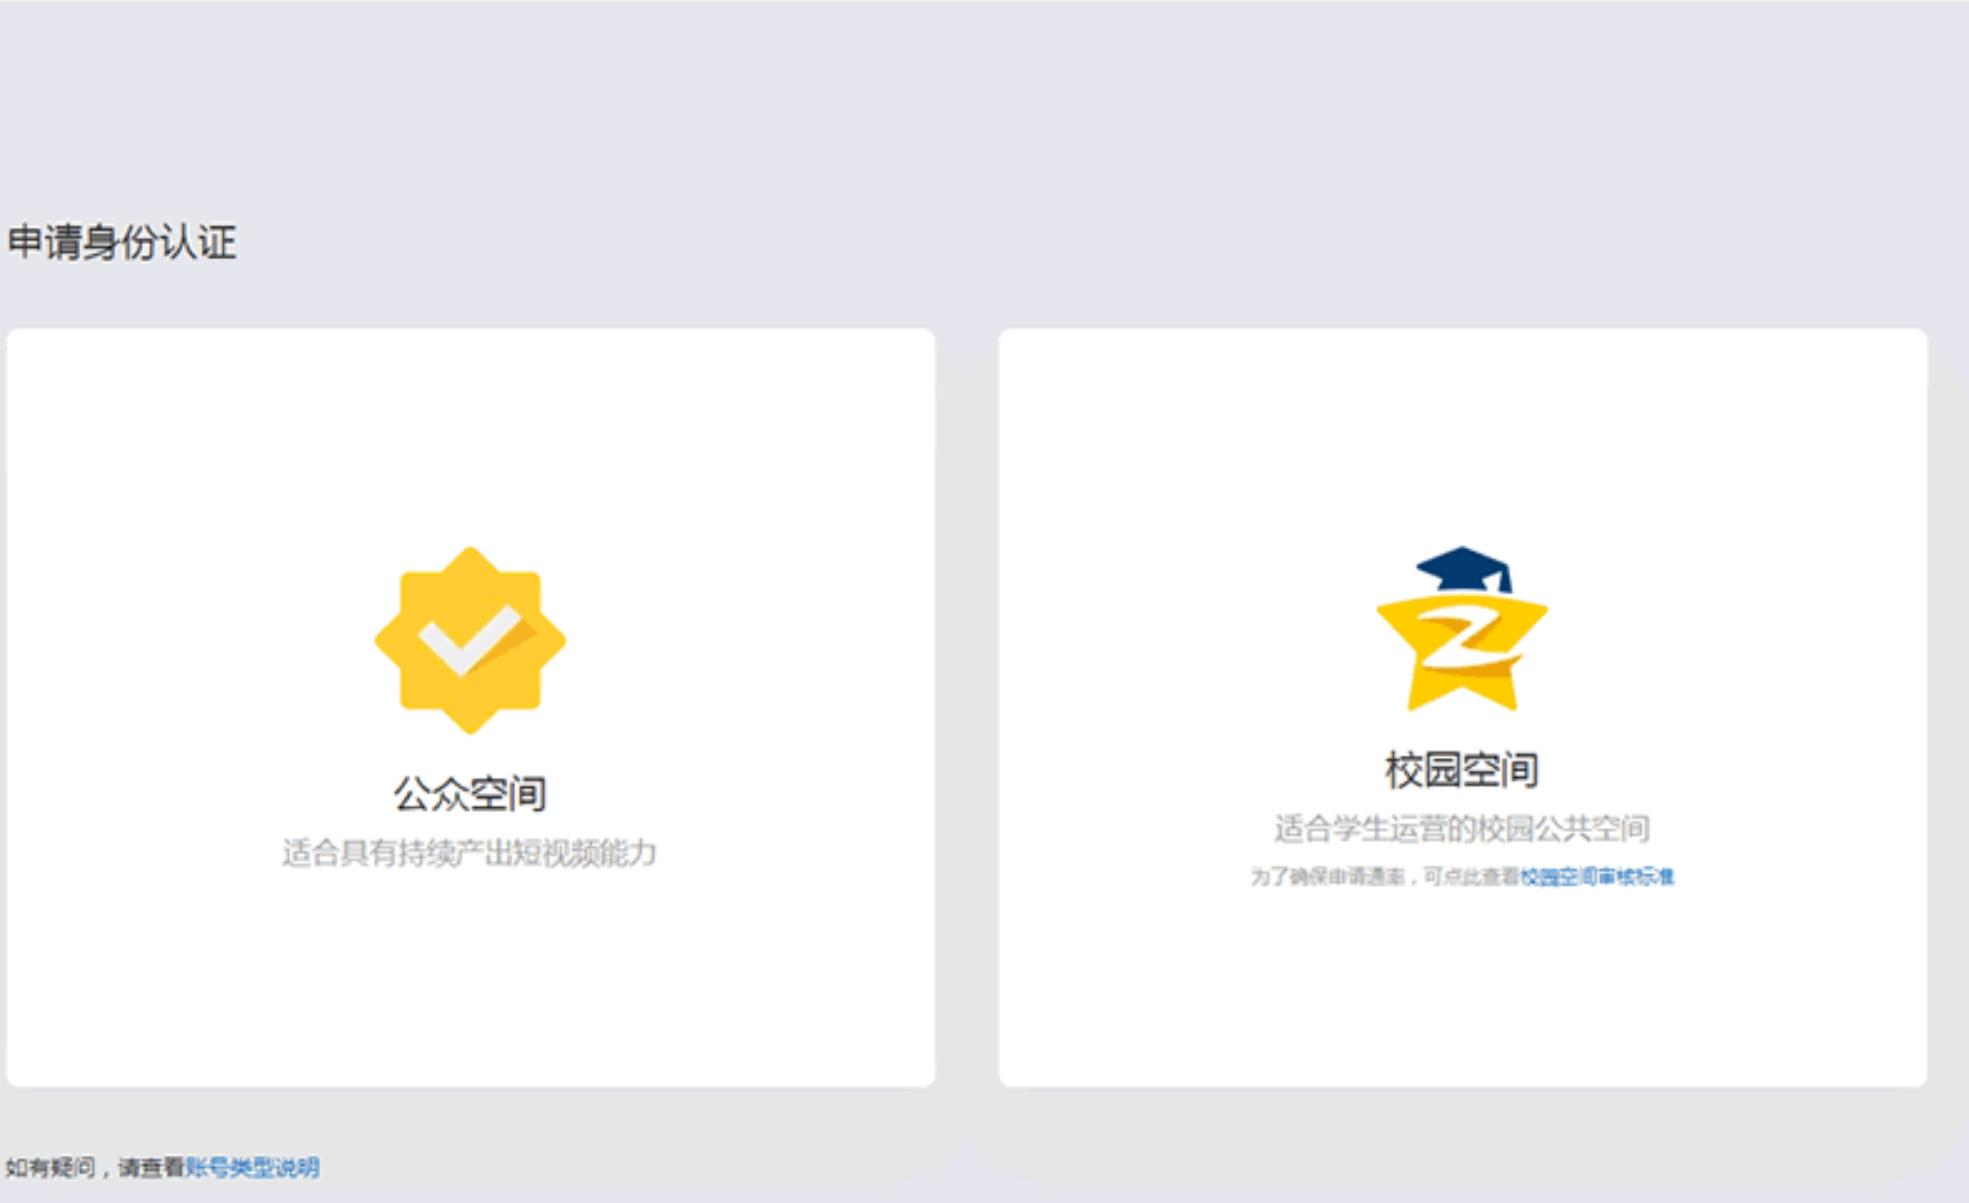 QQ公众空间认证今日重新开放个人申请